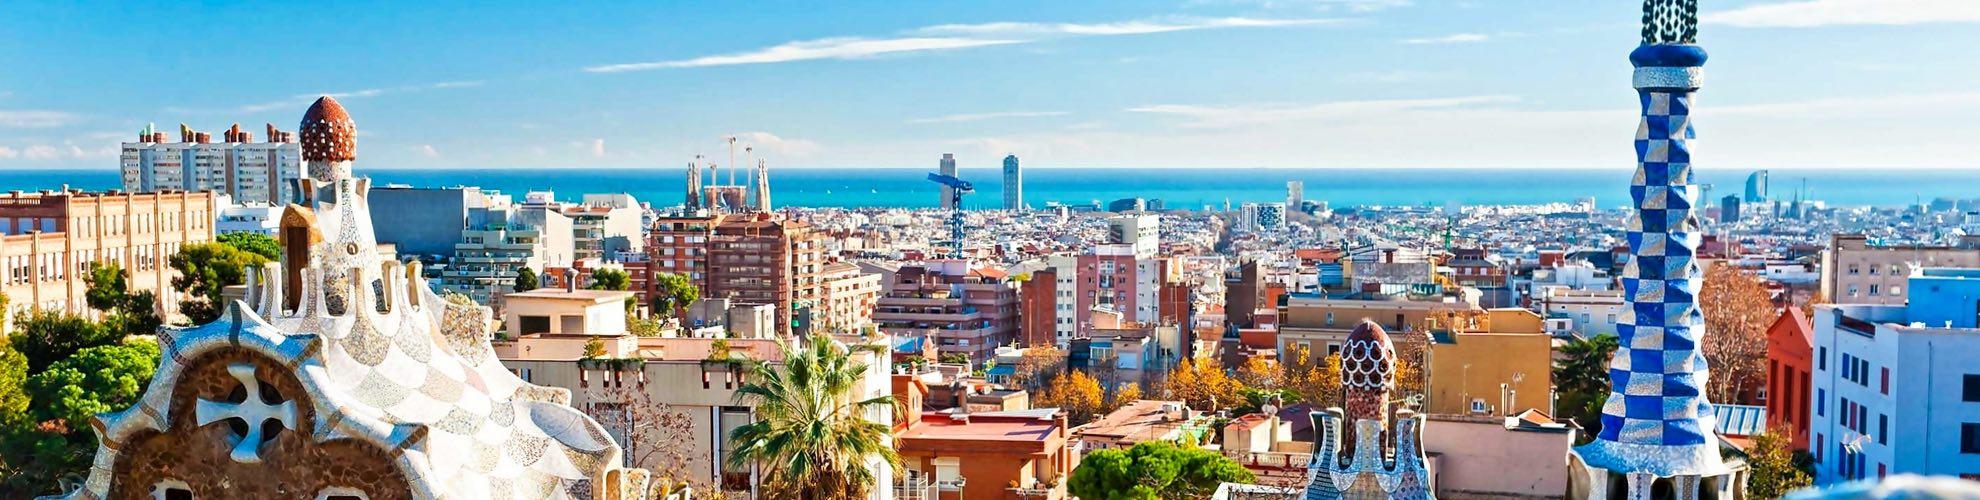 Barcelona Kort Kort Barcelona Catalonien Spanien